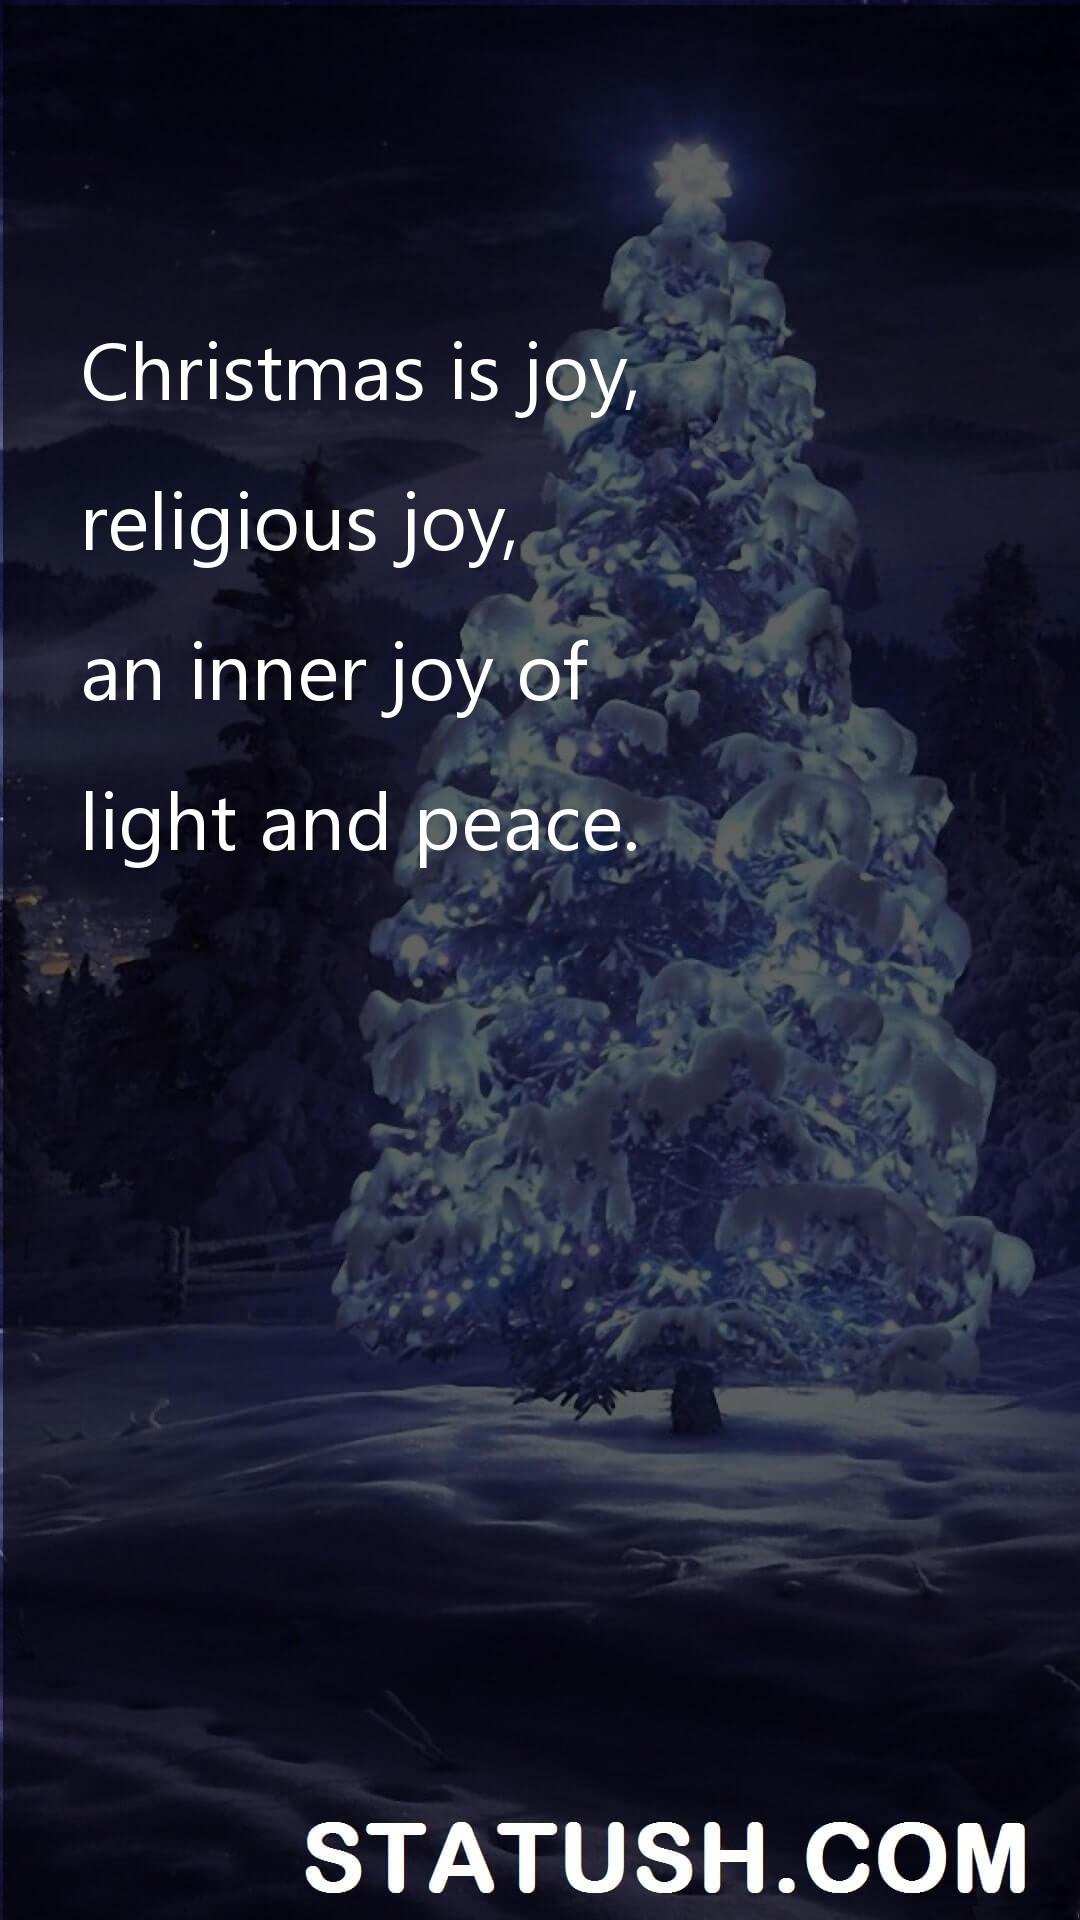 Christmas is joy - Happy Christmas Day